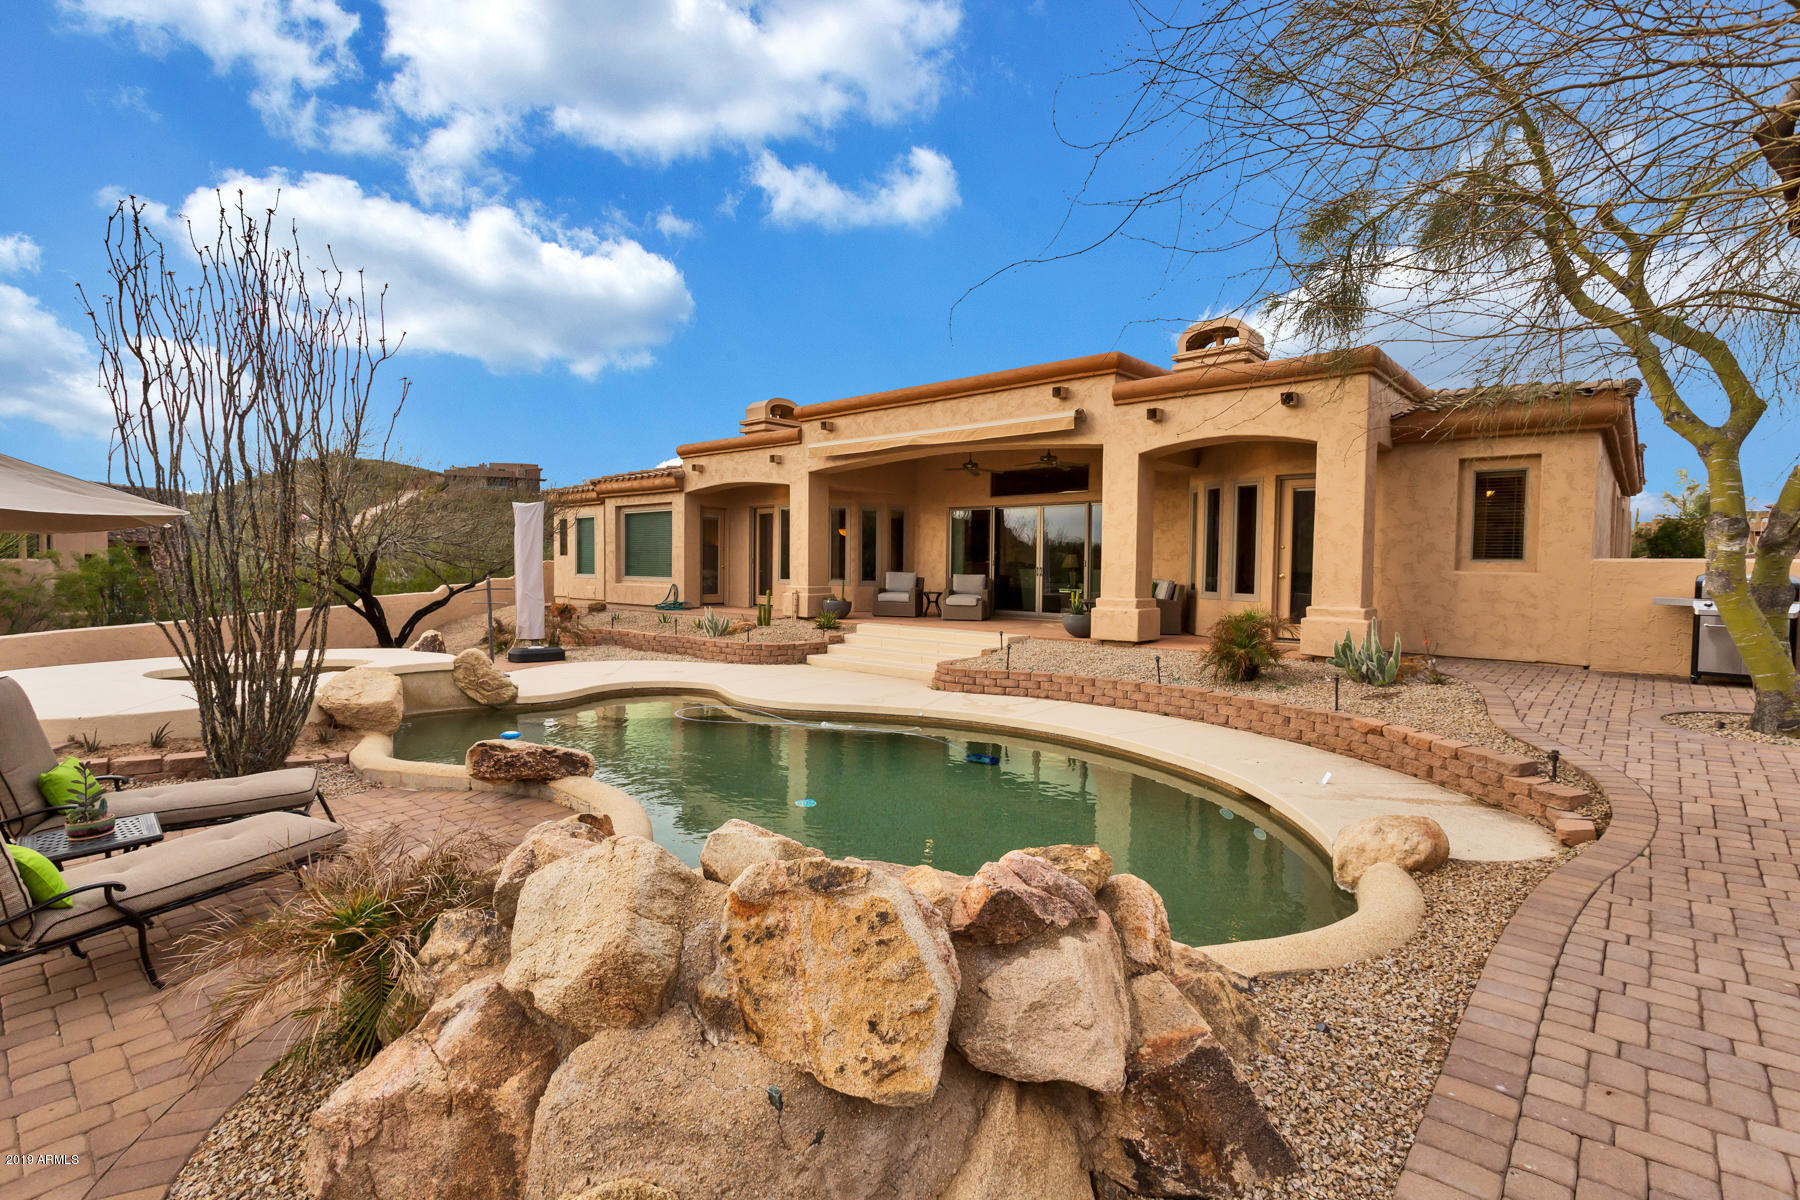 MLS 5908240 11263 E AJAVE Drive, Scottsdale, AZ 85262 Scottsdale AZ Private Pool